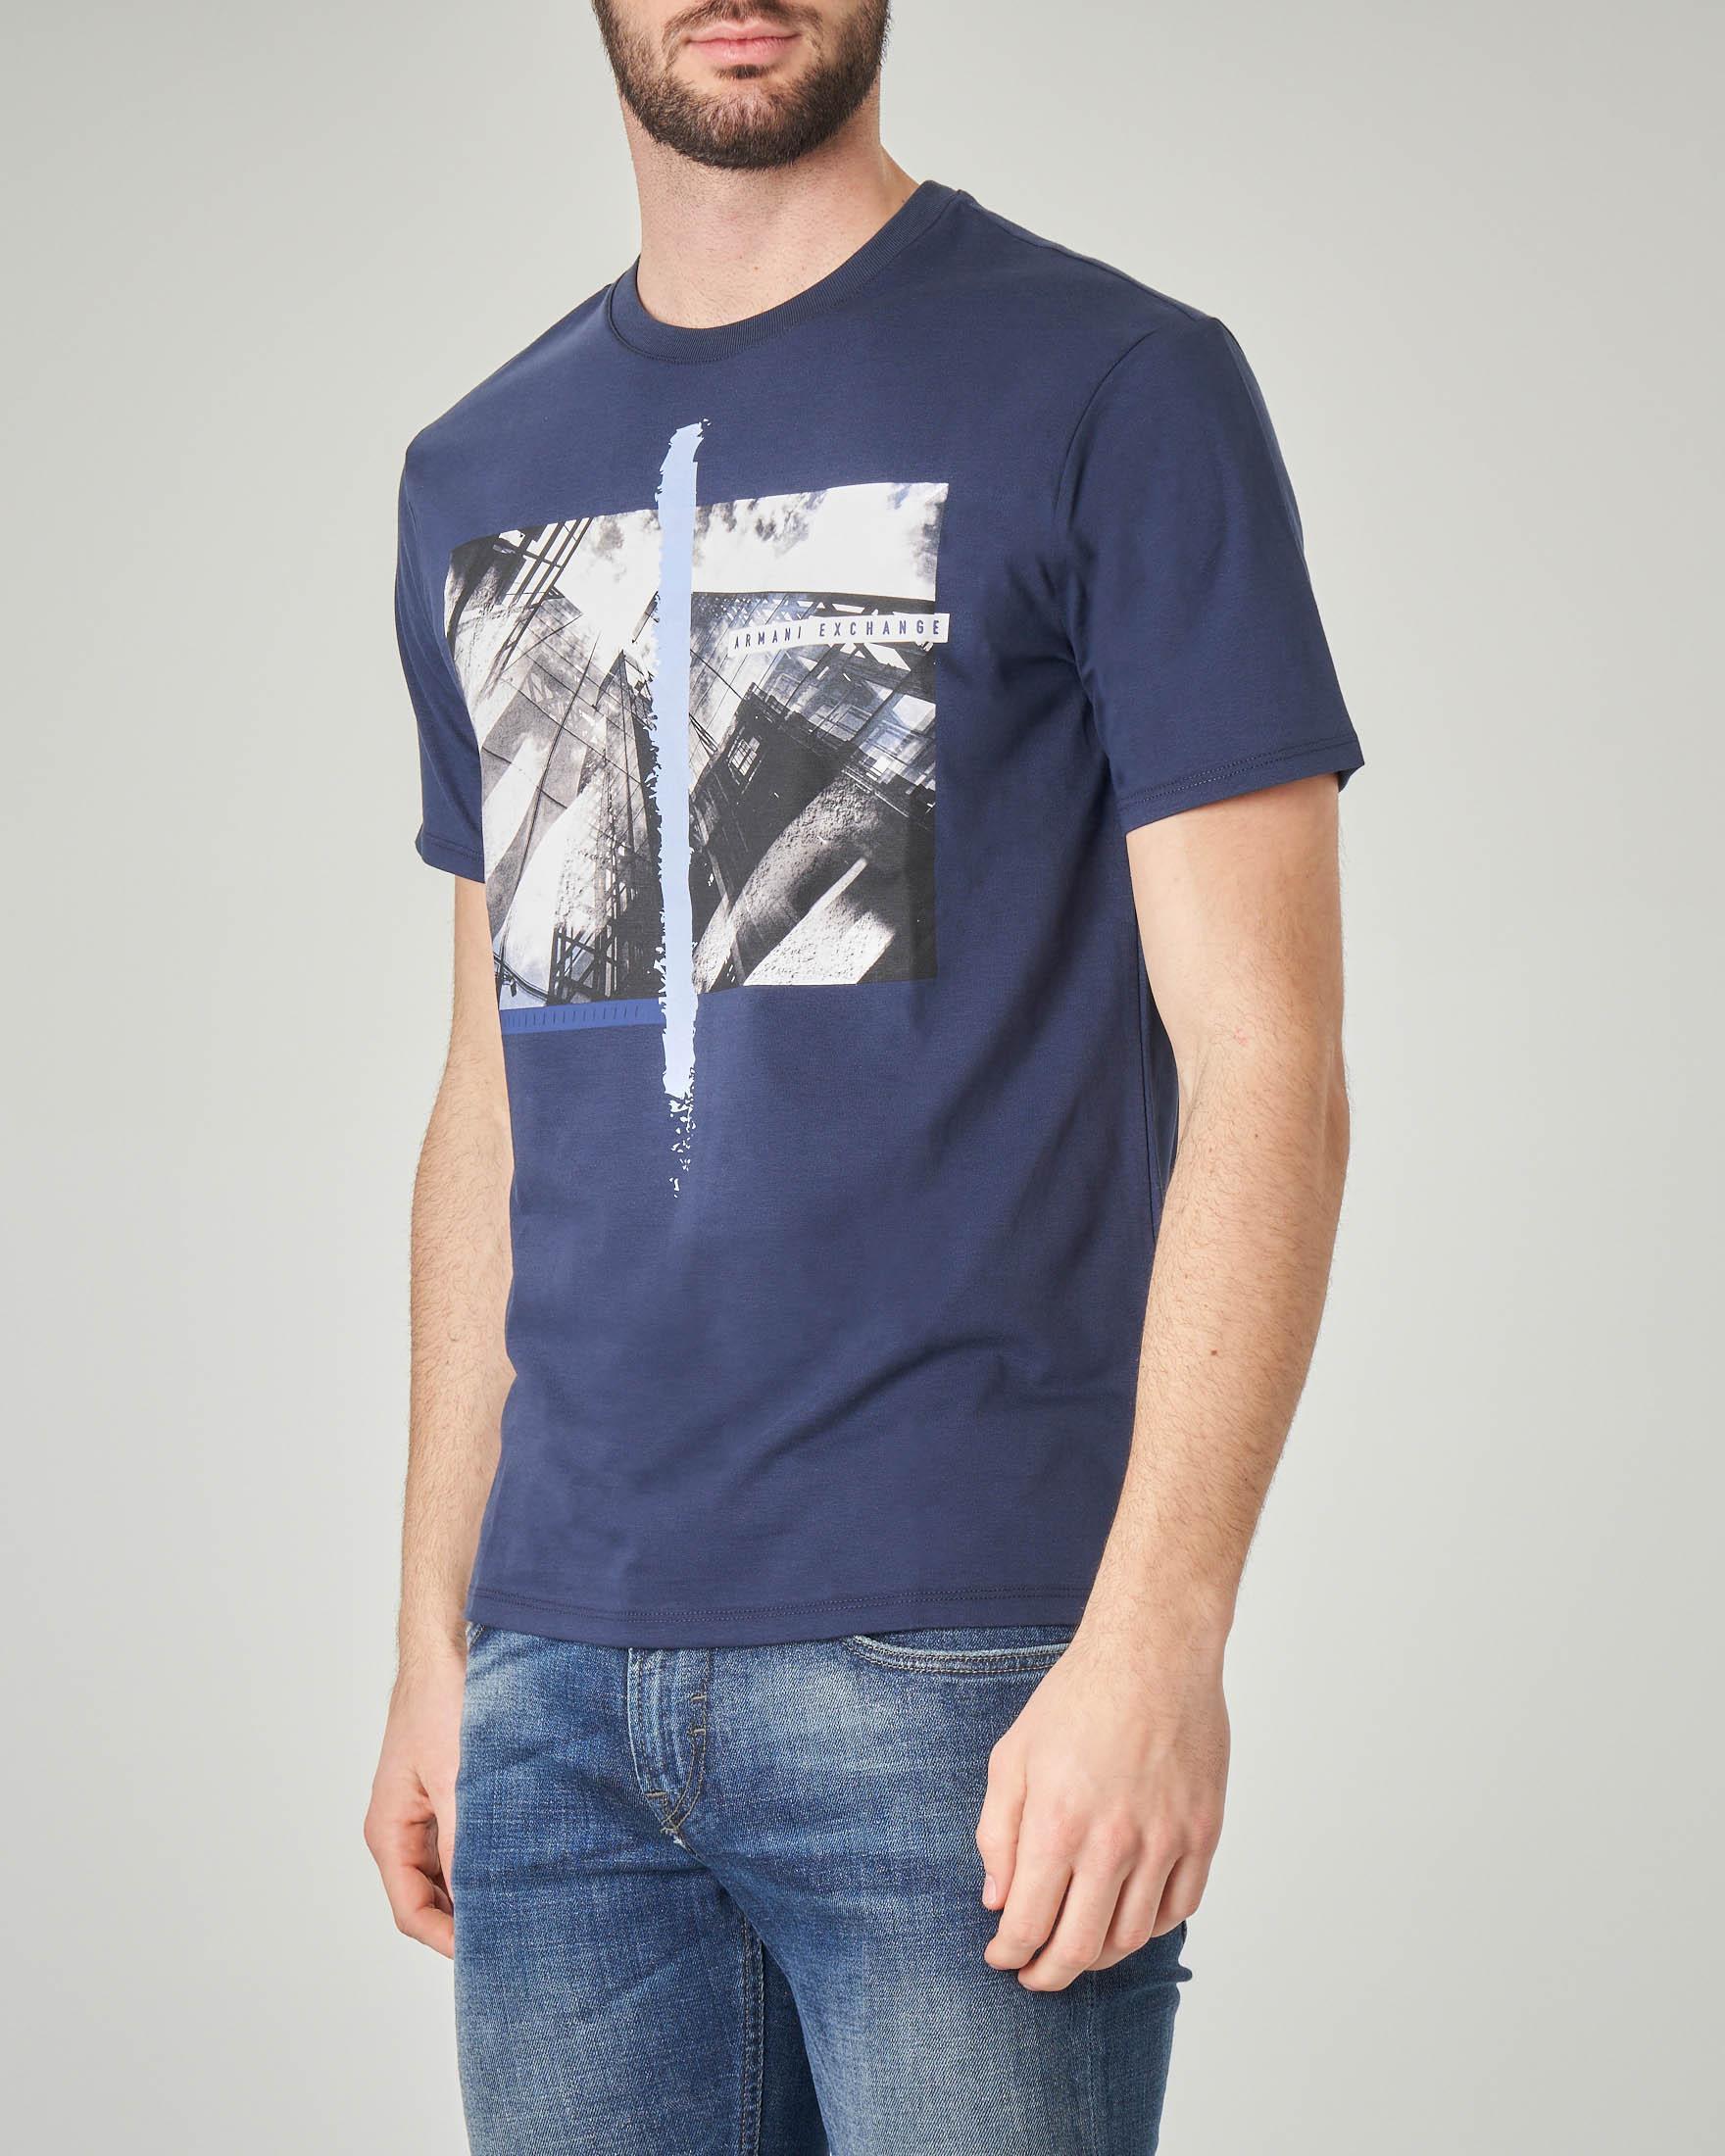 T-shirt blu con stampa fotografica